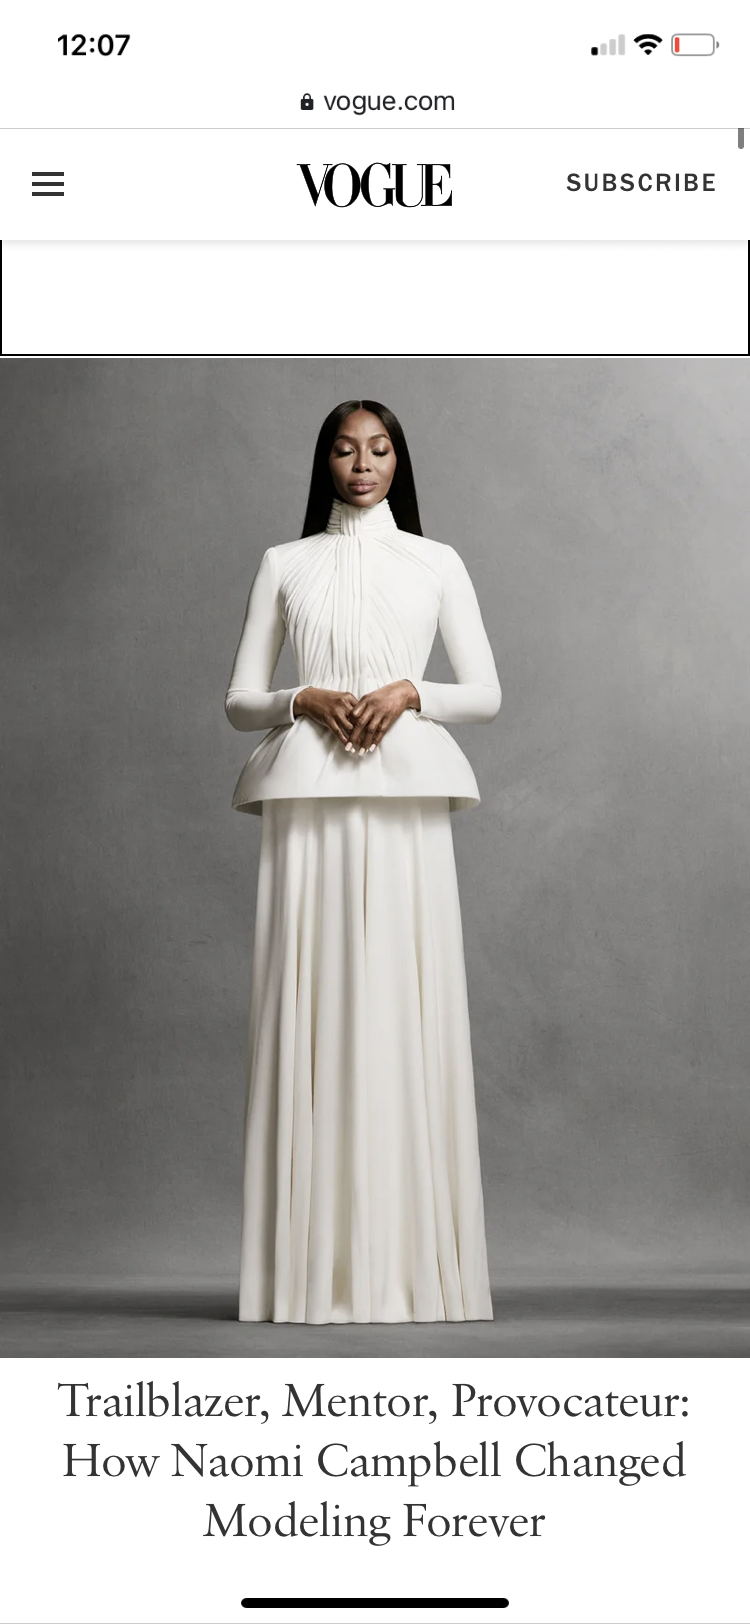 Pin By Jordana Kozyreff On Colgate Virtual Meeting Target 11 11 Long Sleeve Dress Formal Dresses Dresses [ 1624 x 750 Pixel ]